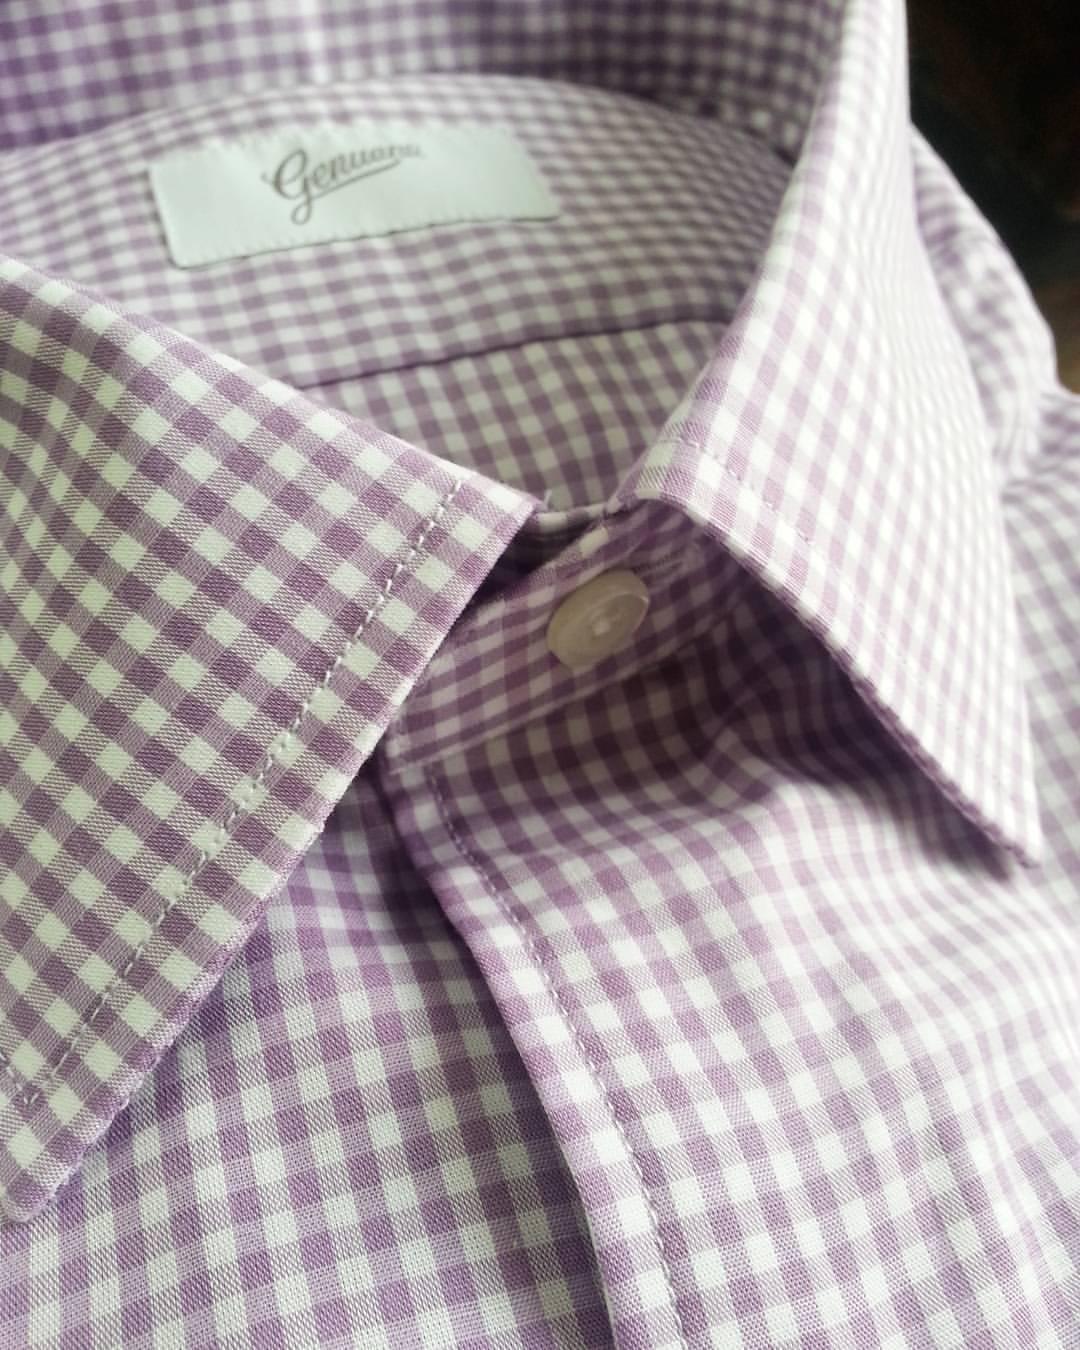 gingham_custom_shirt_lavendar.jpg